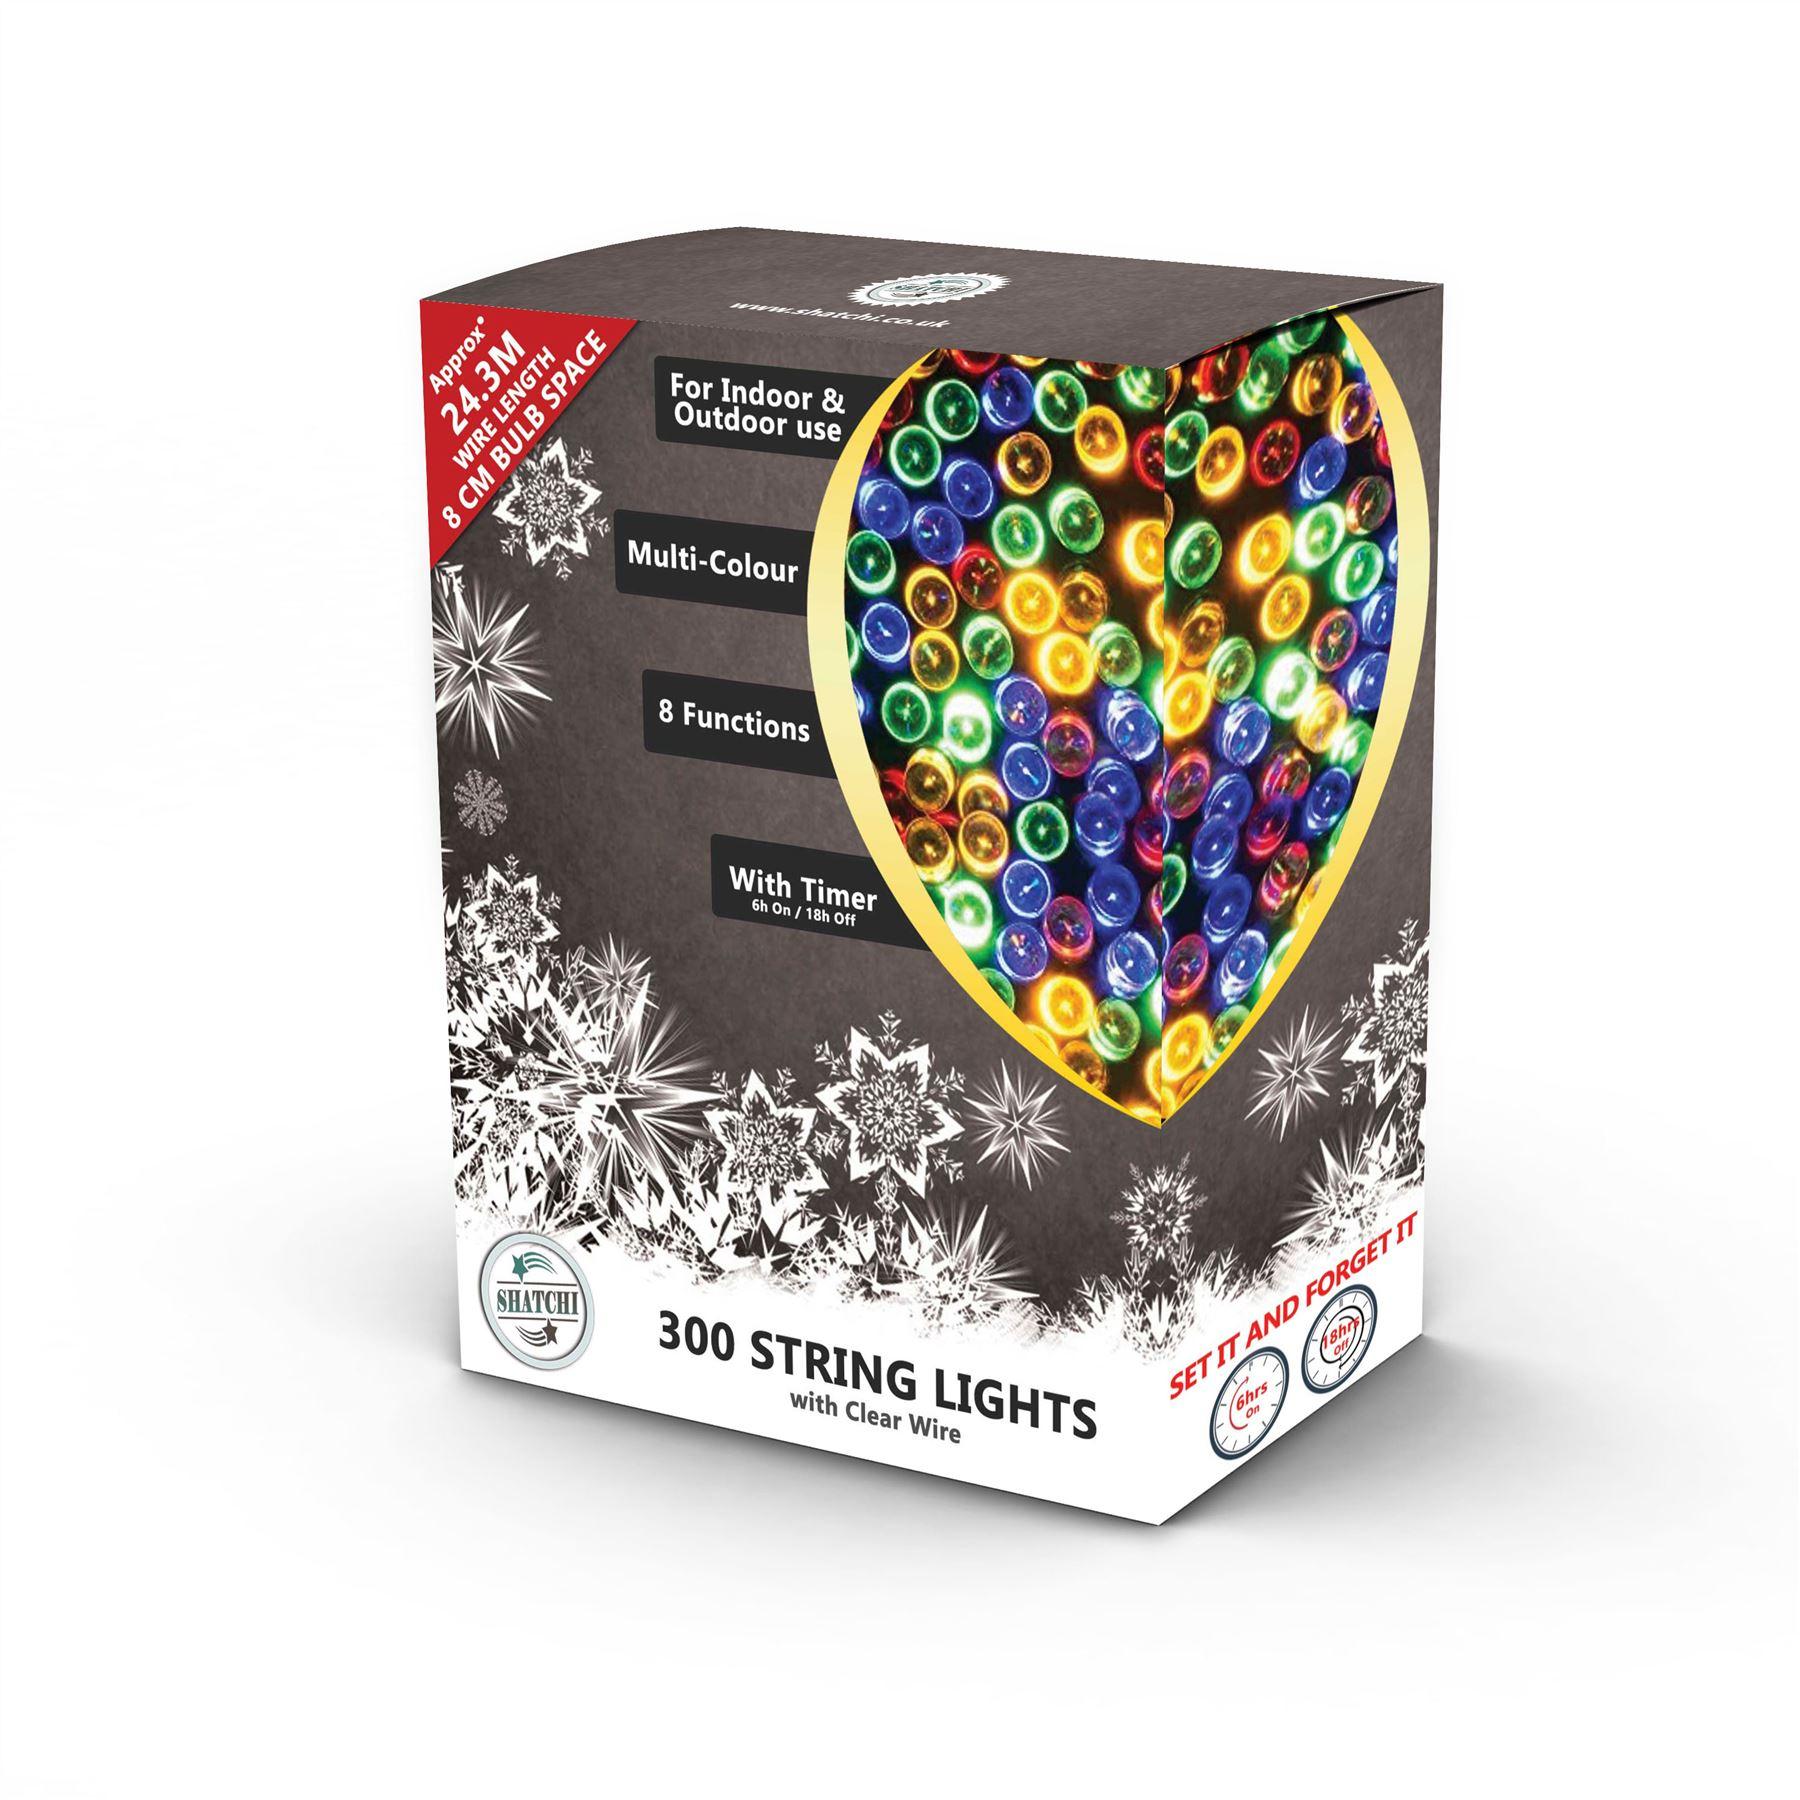 100-200-300-400-500-LED-Christmas-String-Fairy-Lights-Xmas-Decorations-Tree miniature 27